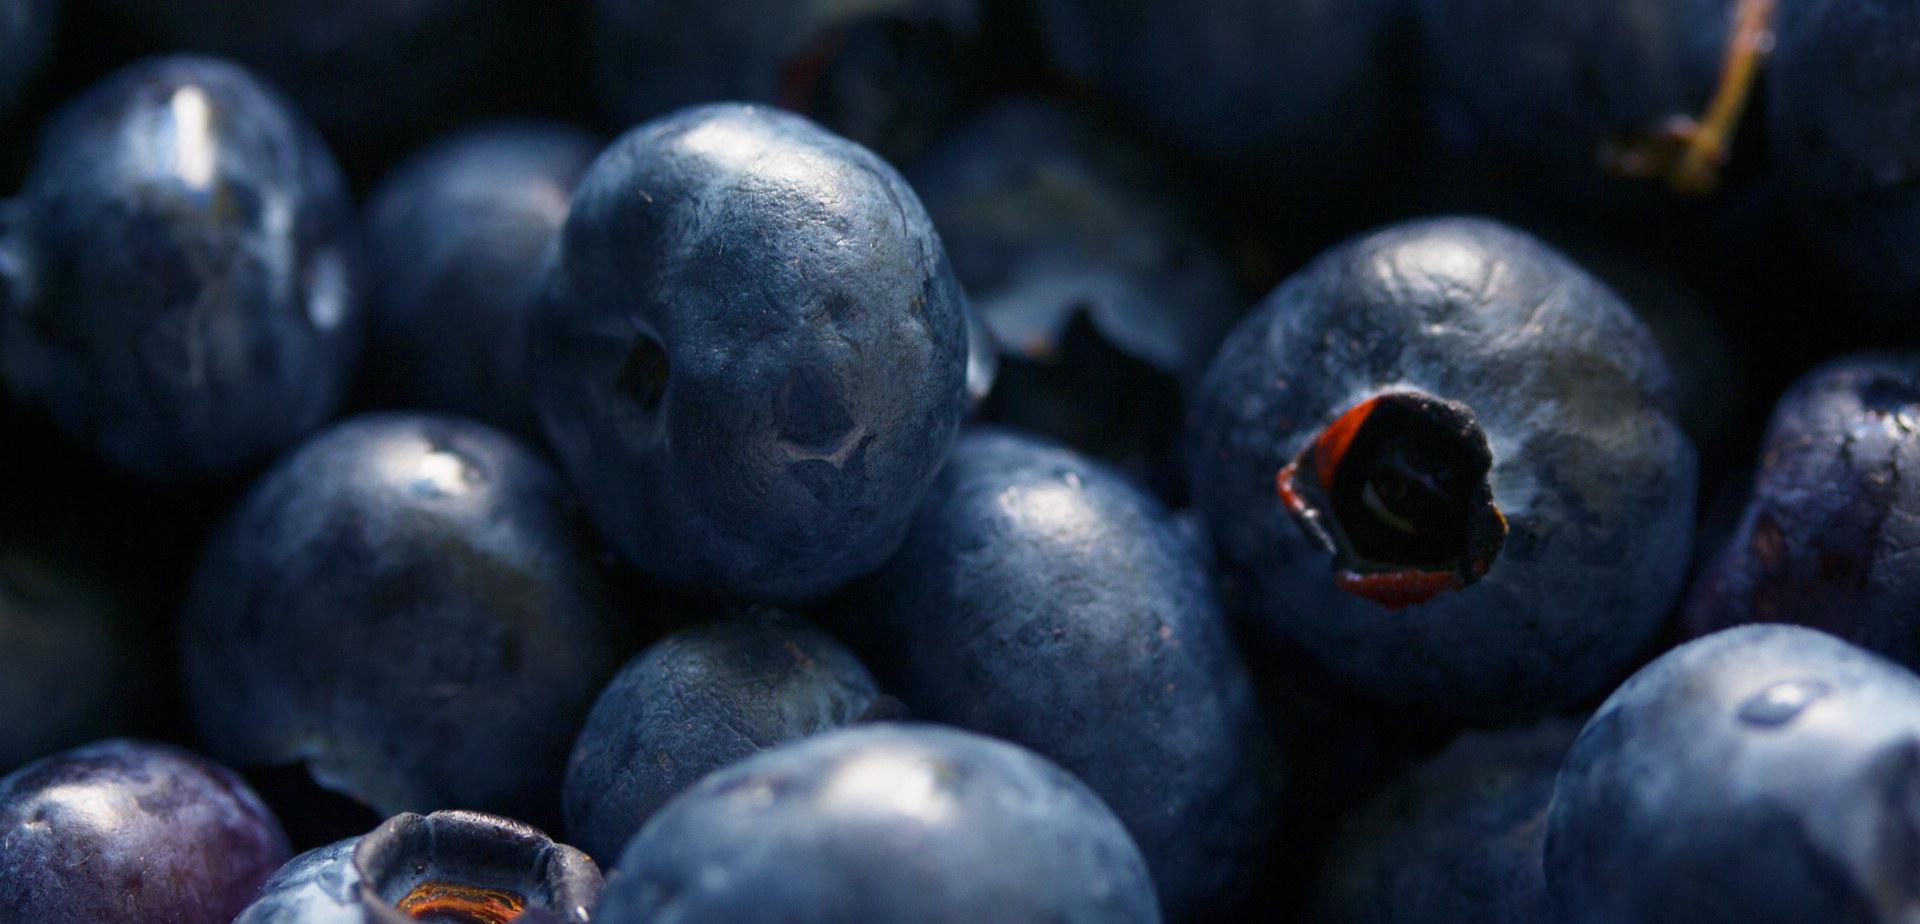 antioxidant-berries-bilberry-139749.jpg